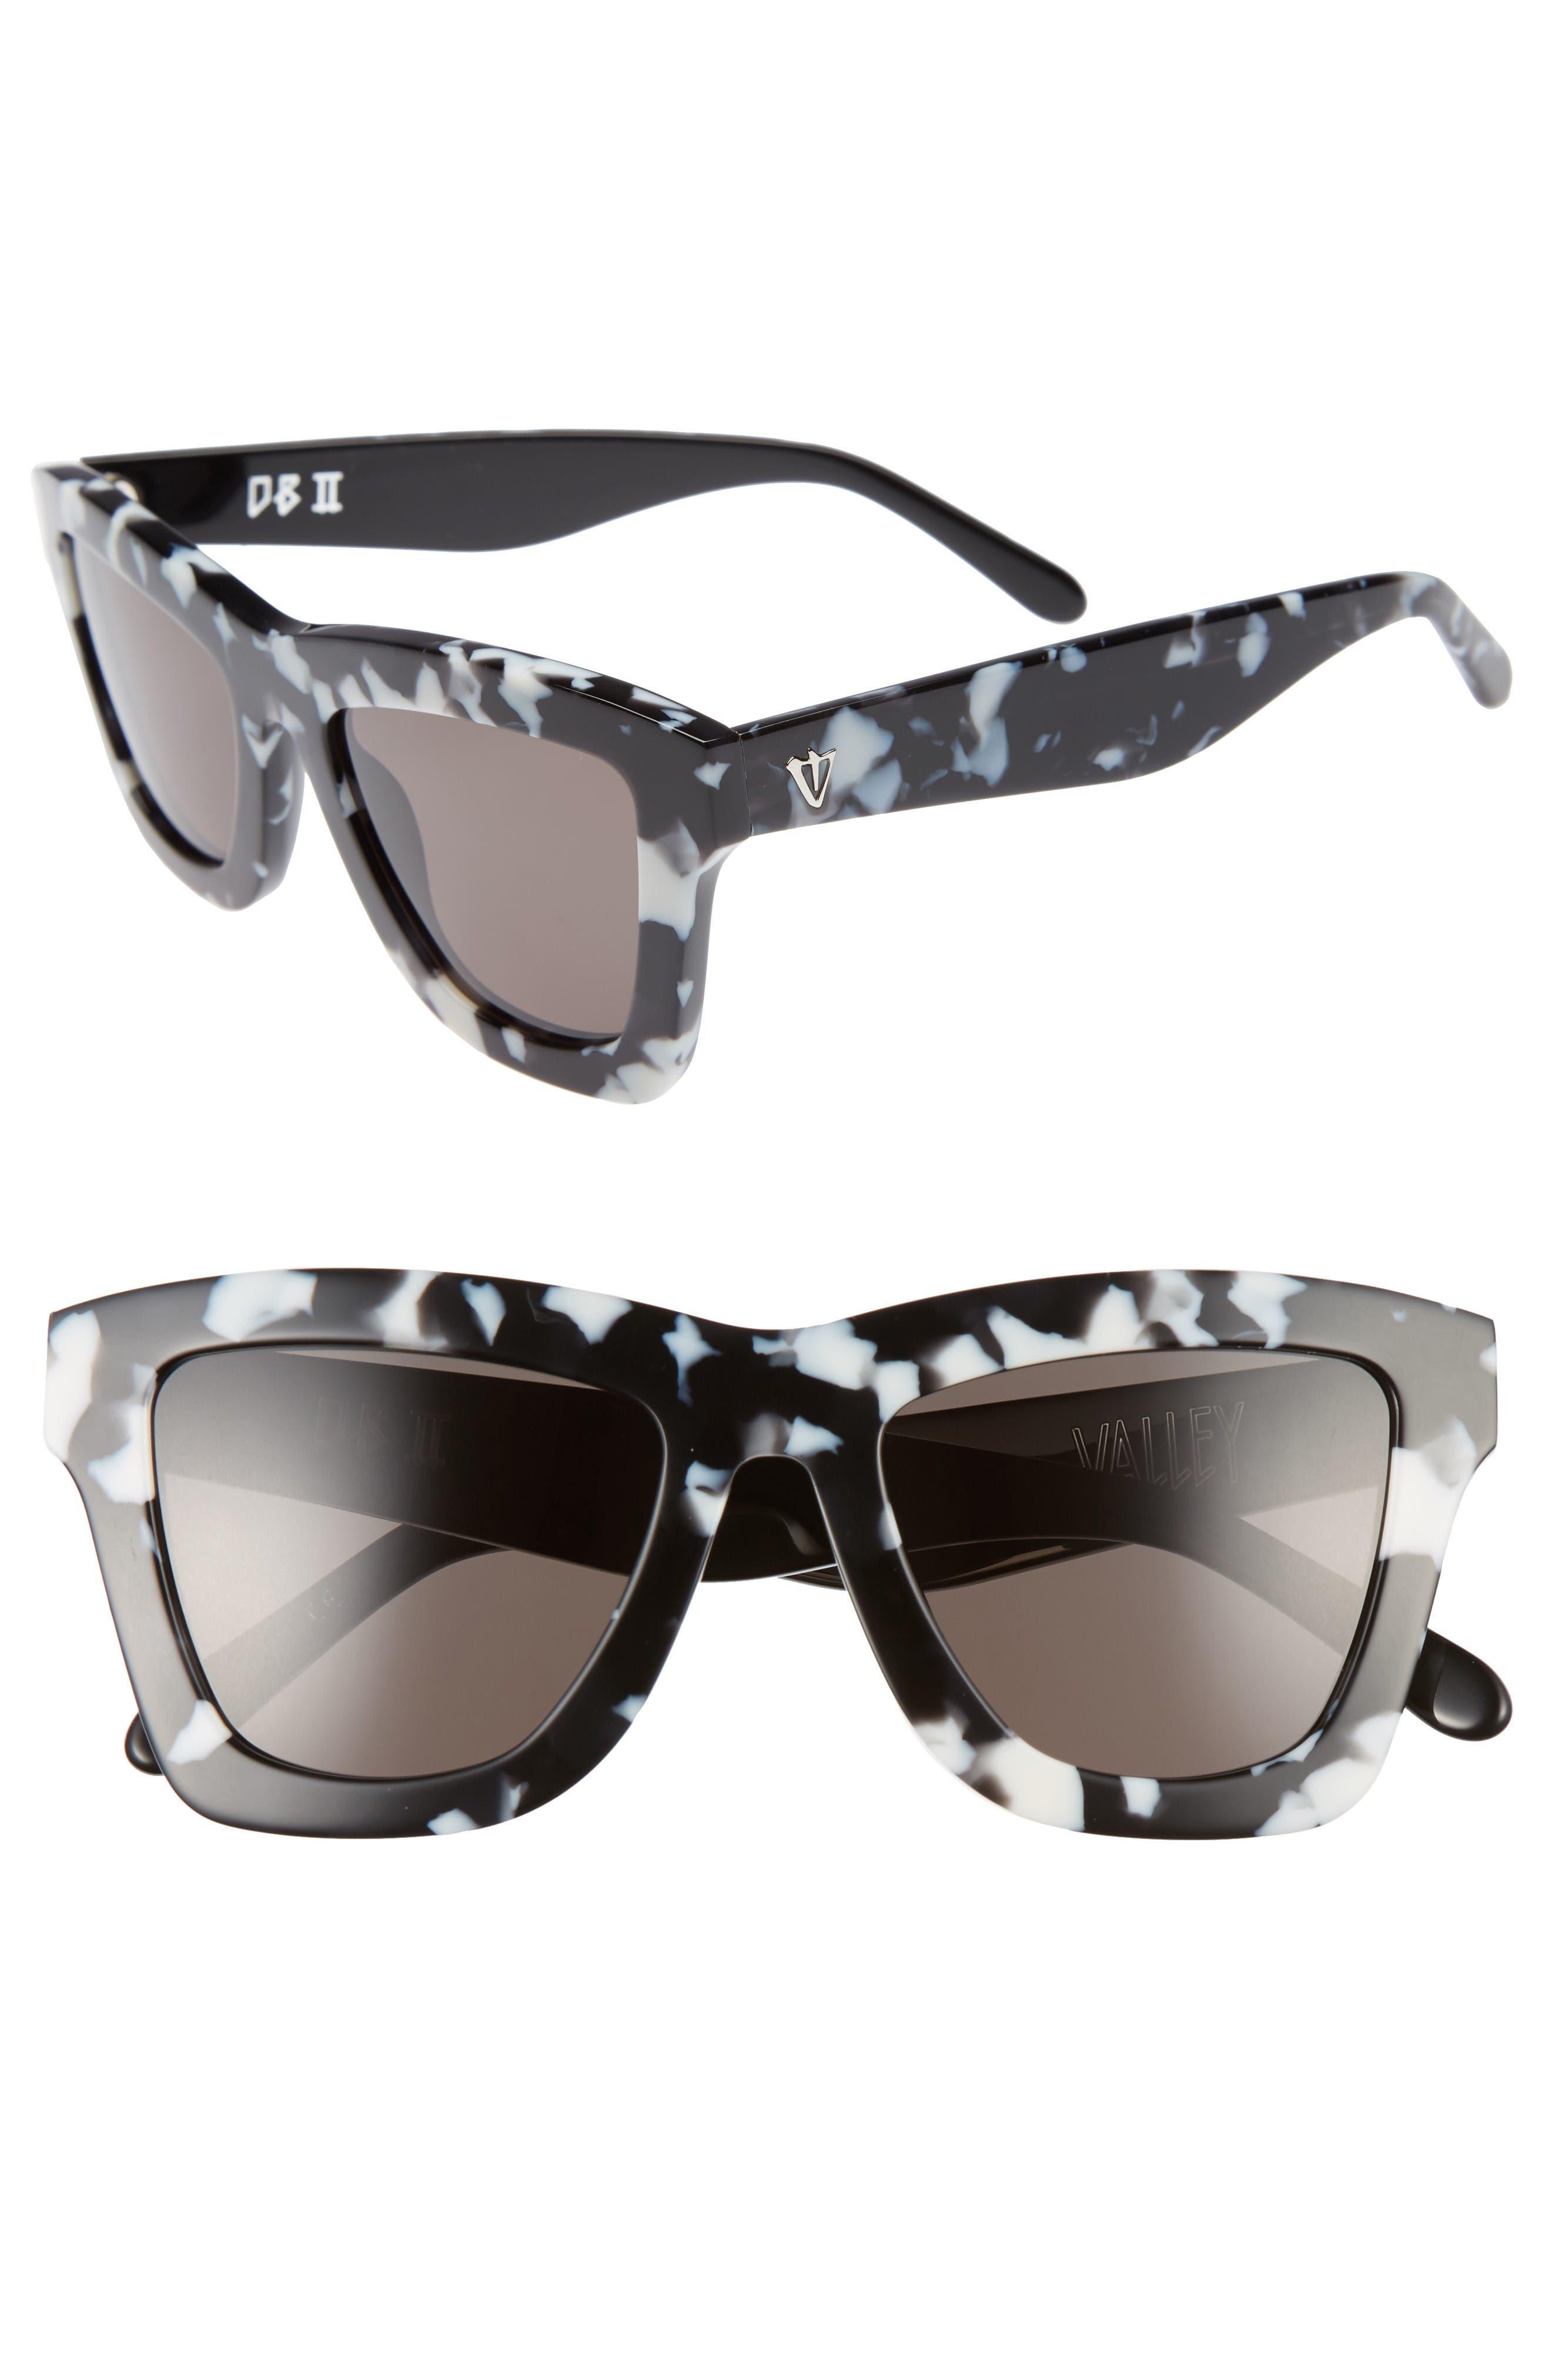 VALLEY DB II 50mm Retro Sunglasses